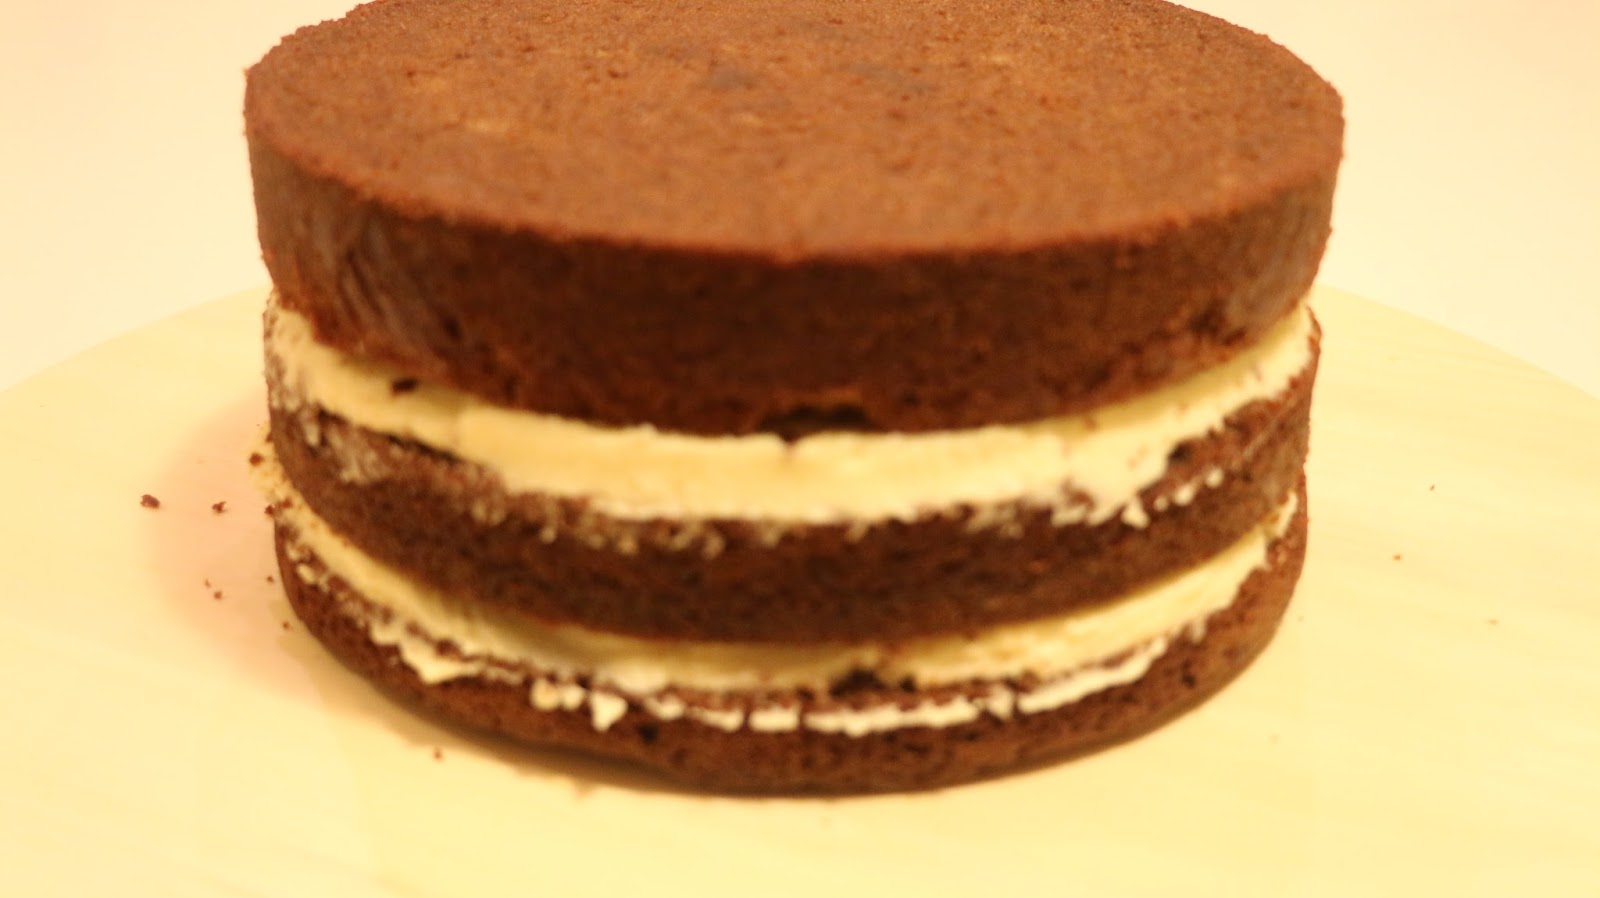 Recette De Garniture Cake Design : Nebouladelice: Cake chocolat pour Cake design